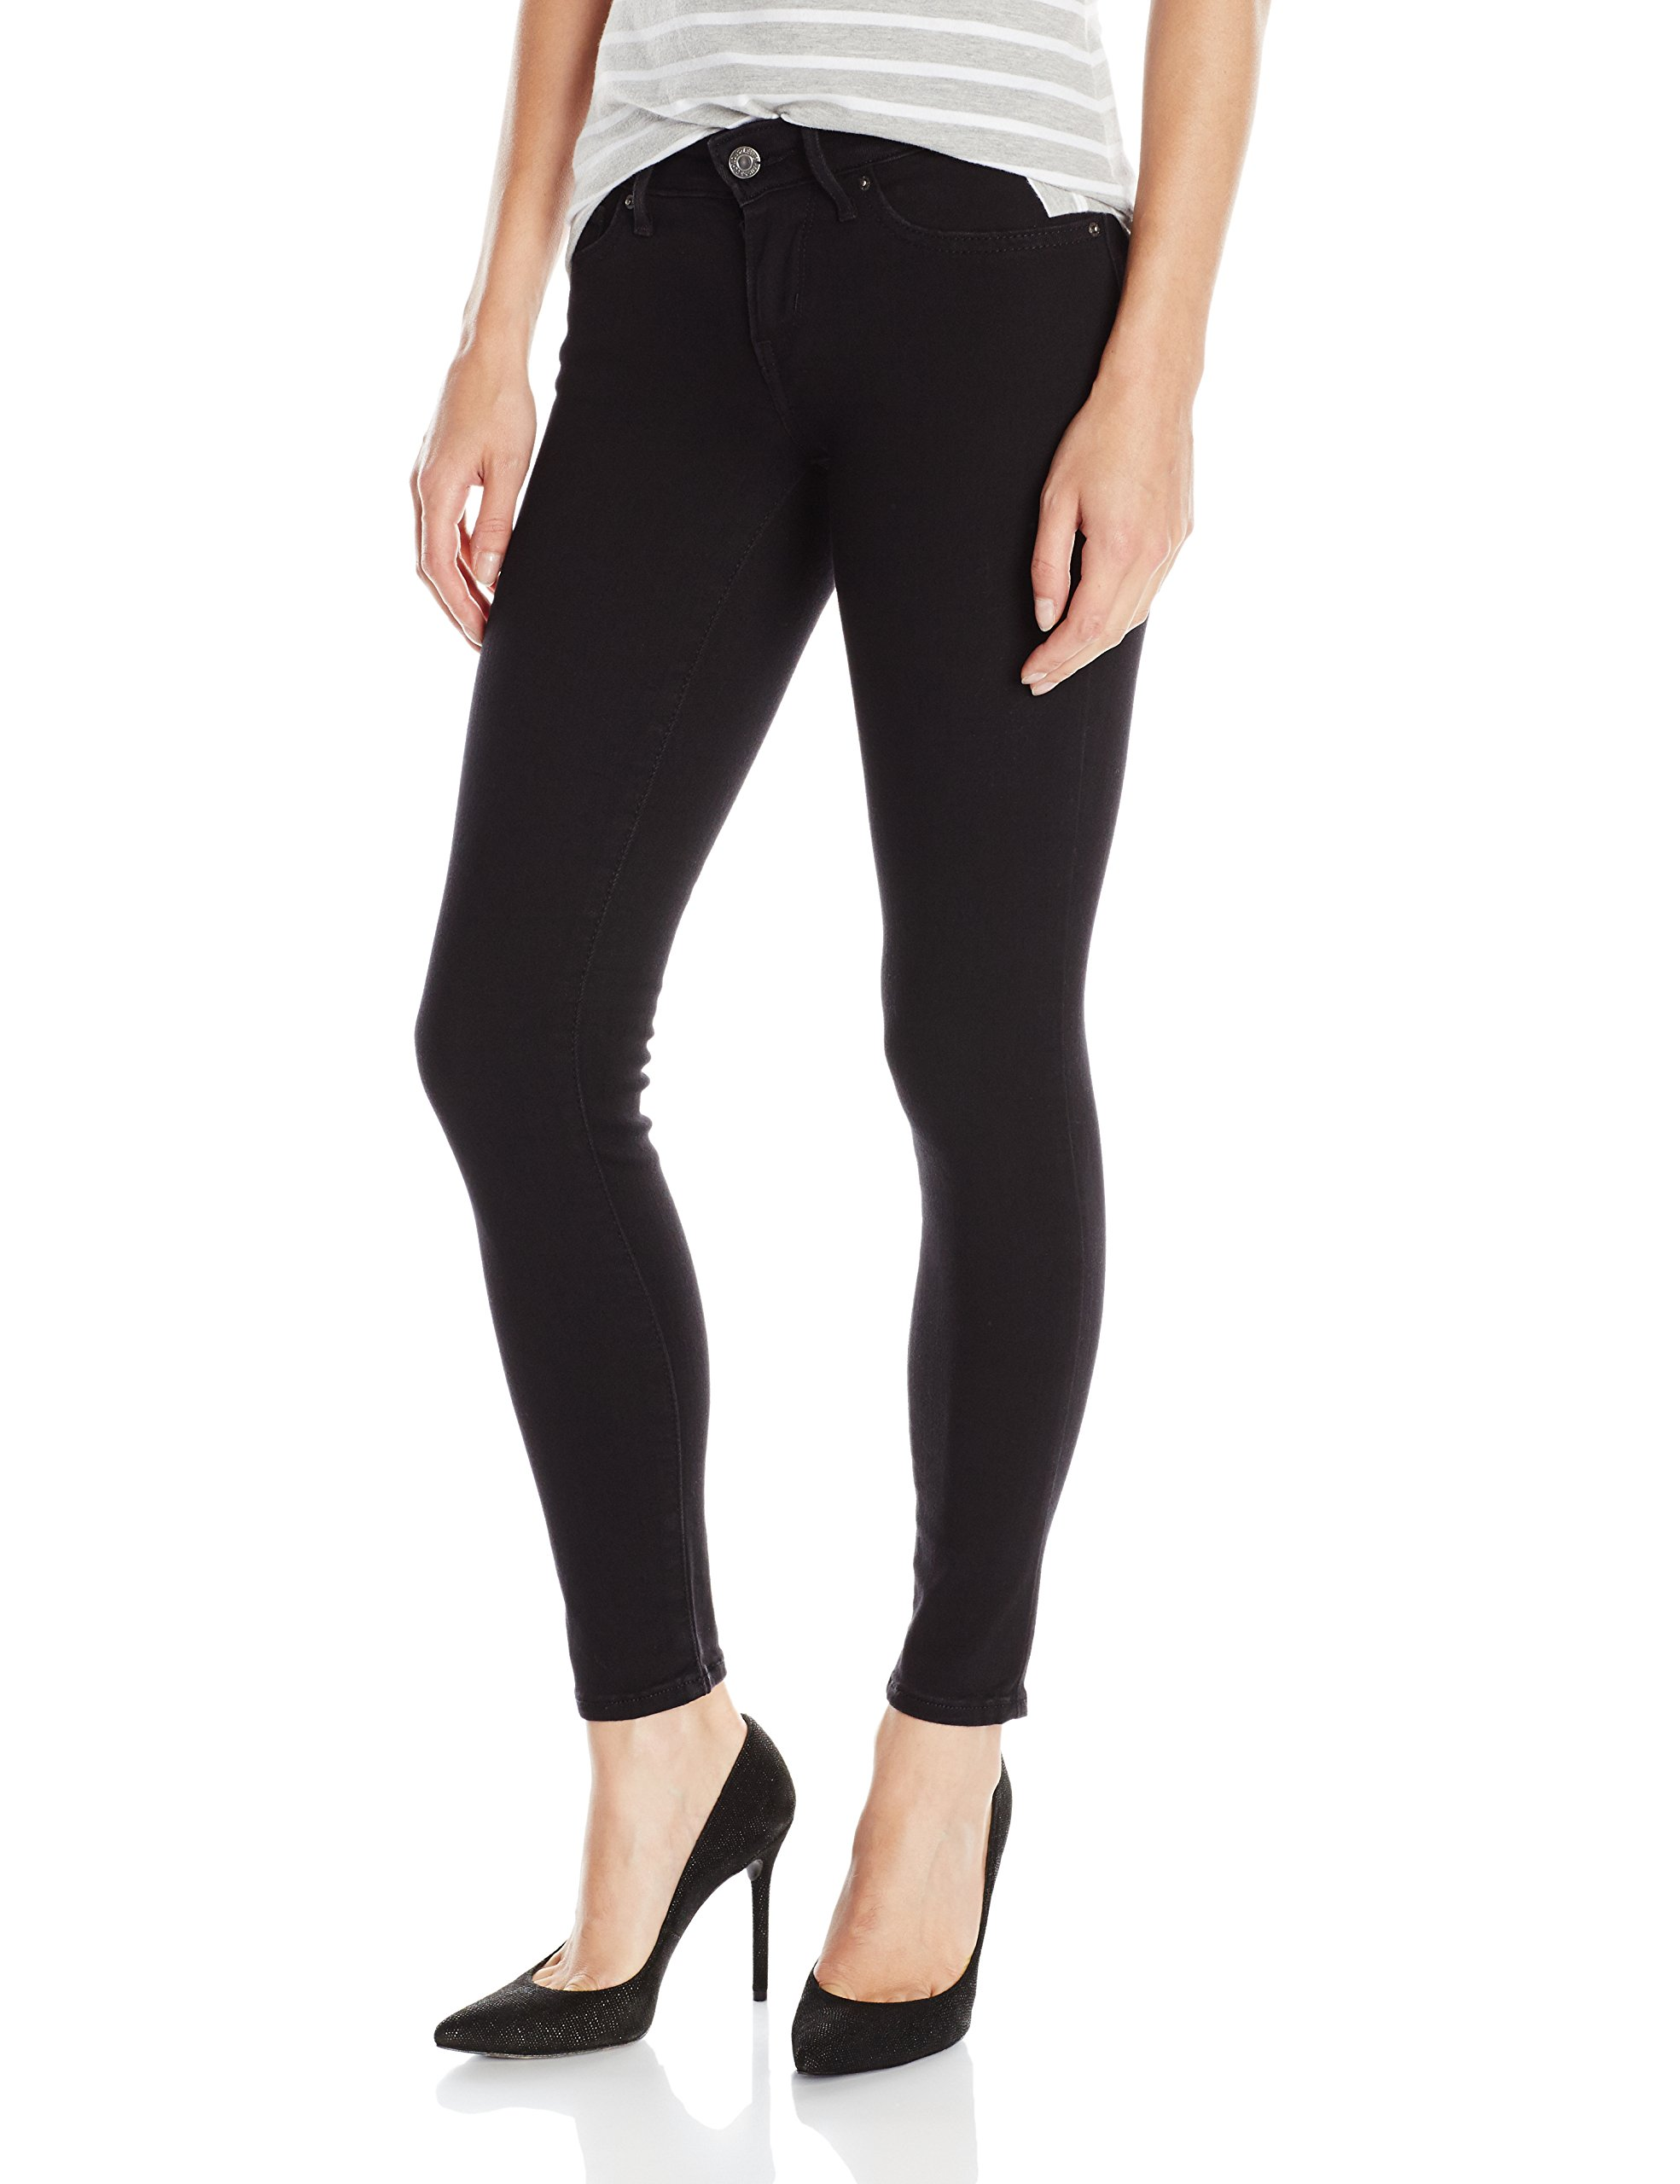 Levi's Women's 711 Skinny Jeans,Soft Black,30Wx32L